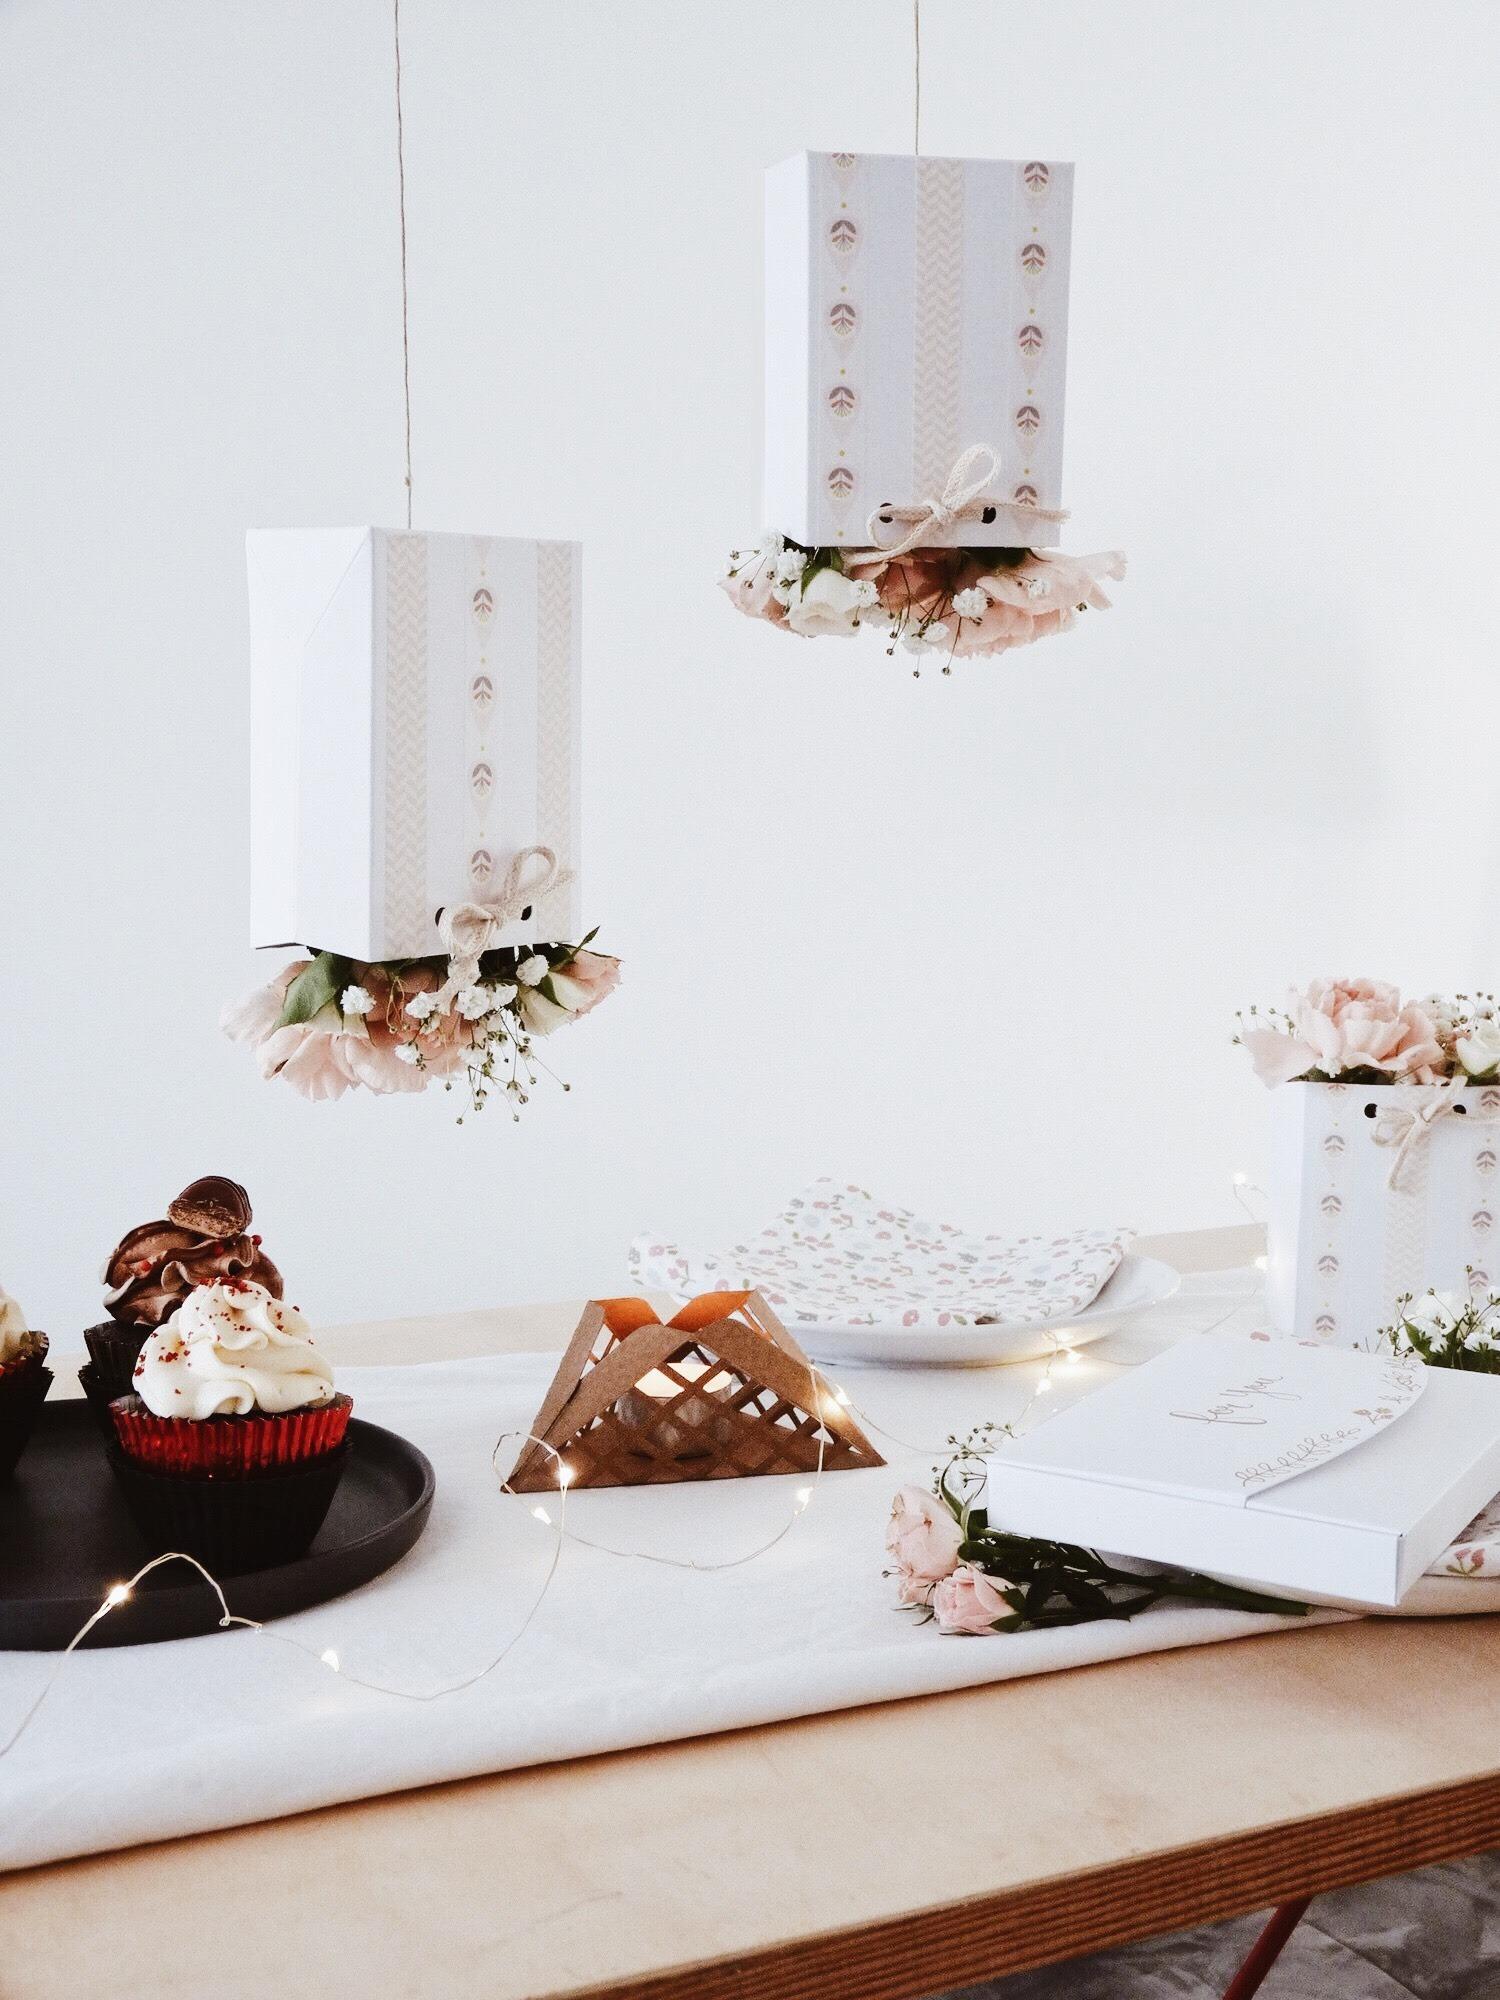 decoration table fete des meres 8 black confetti. Black Bedroom Furniture Sets. Home Design Ideas